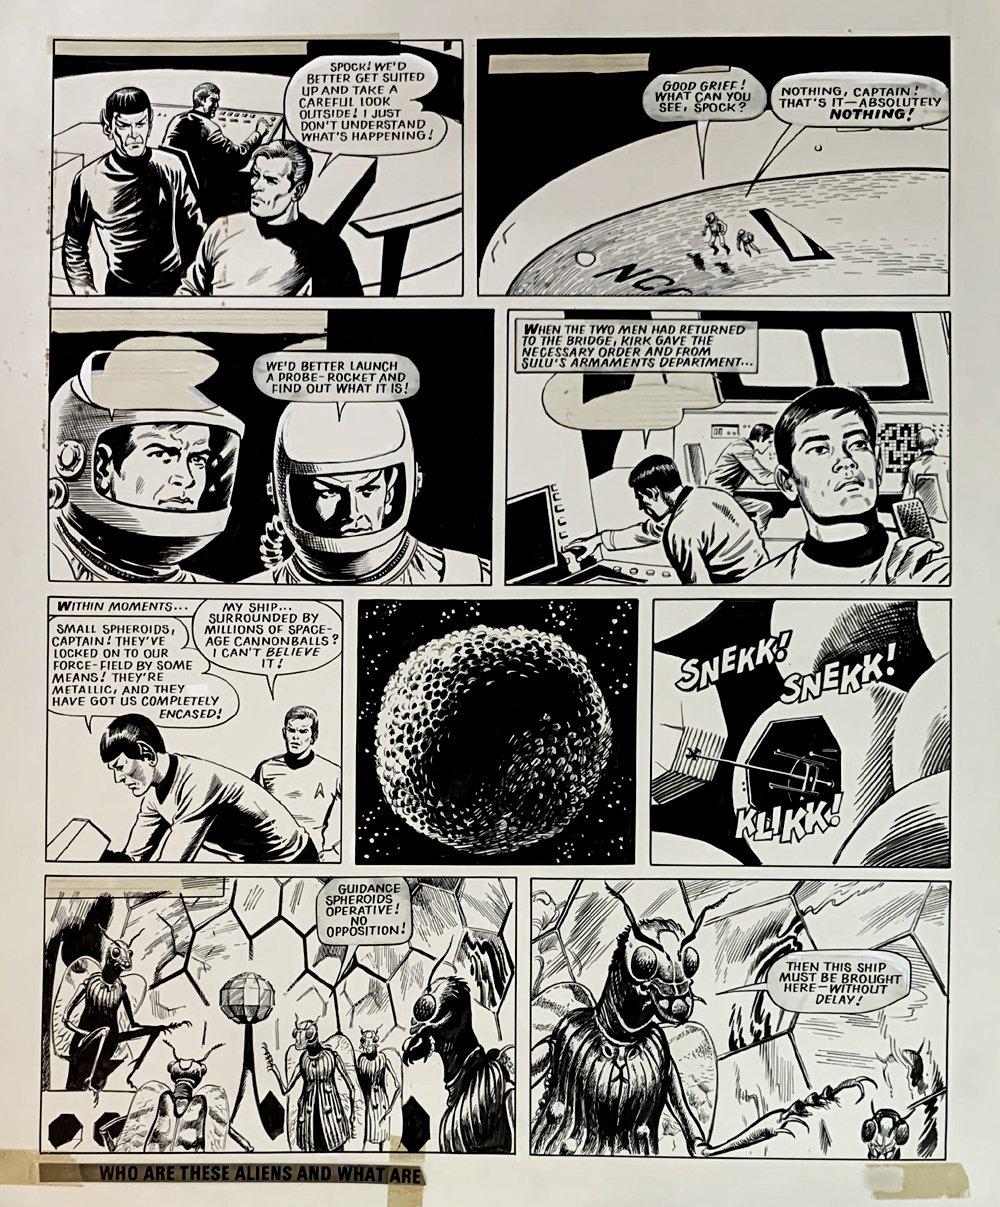 Star Trek Newspaper Strip 2-24-1973 (VERY LARGE)